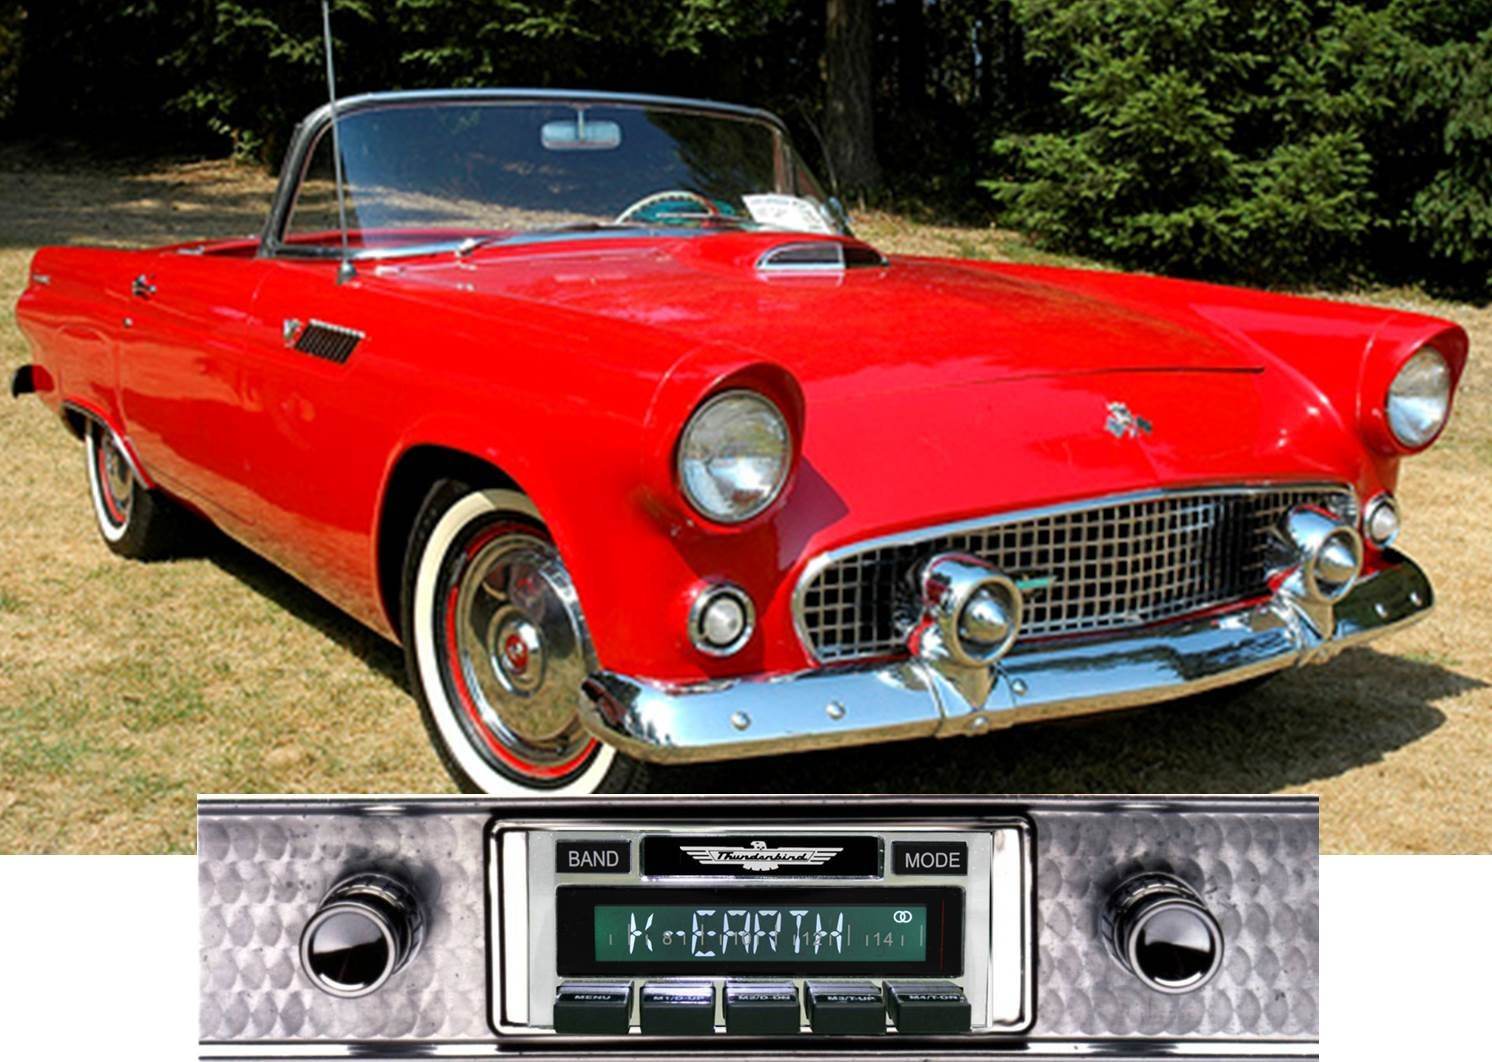 1955-1957 Ford Thunderbird USA-630 II High Power 300 watt AM FM Car Stereo/Radio with iPod Docking Cable